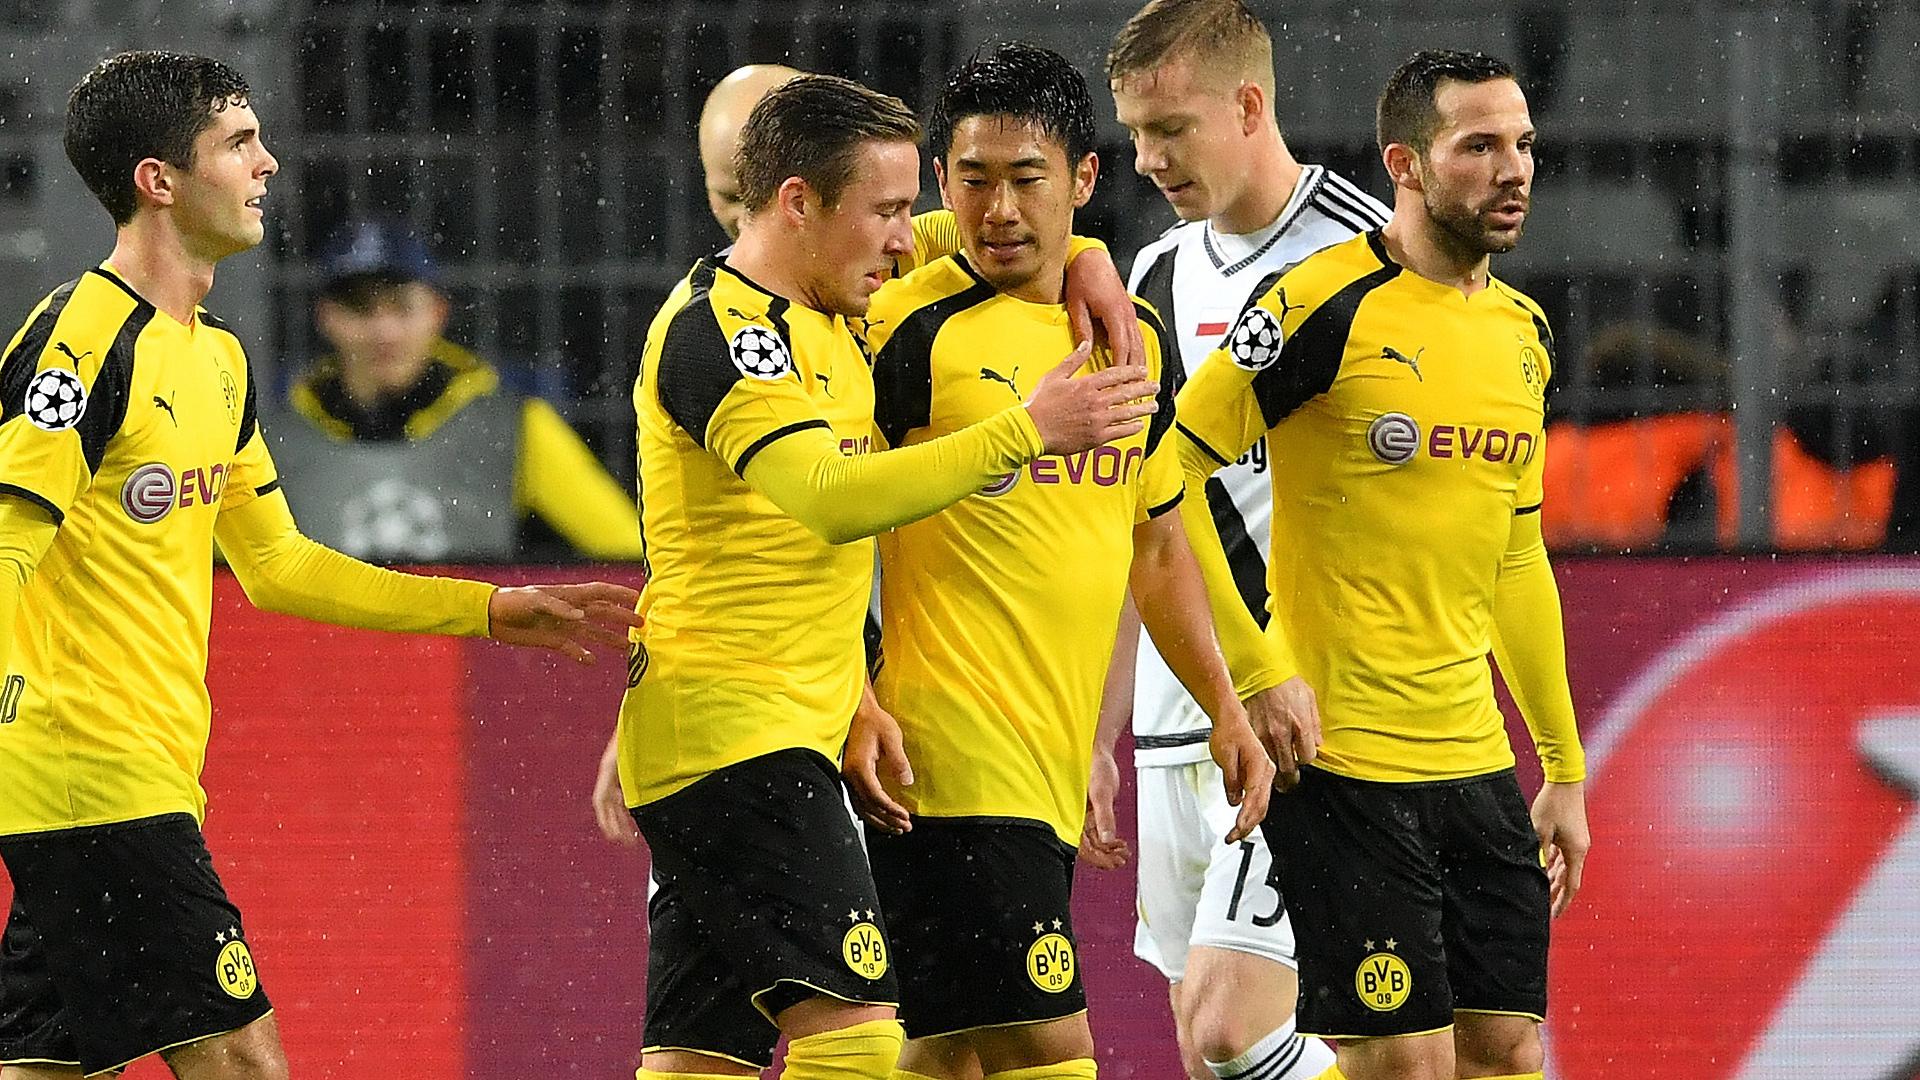 Borussia Dortmund High Definition Wallpapers